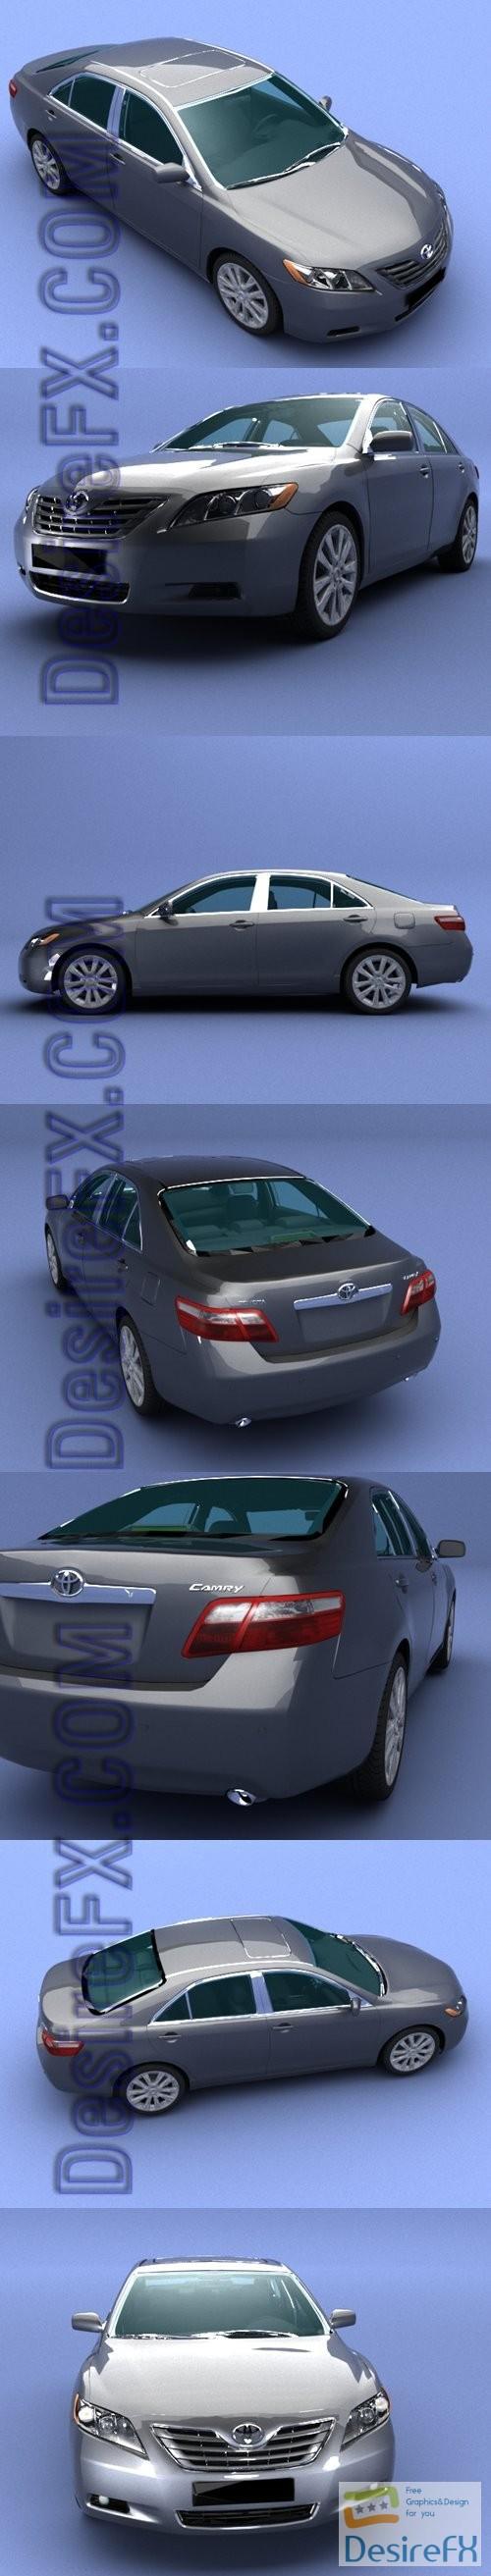 Toyota Camry 2010 3D Model